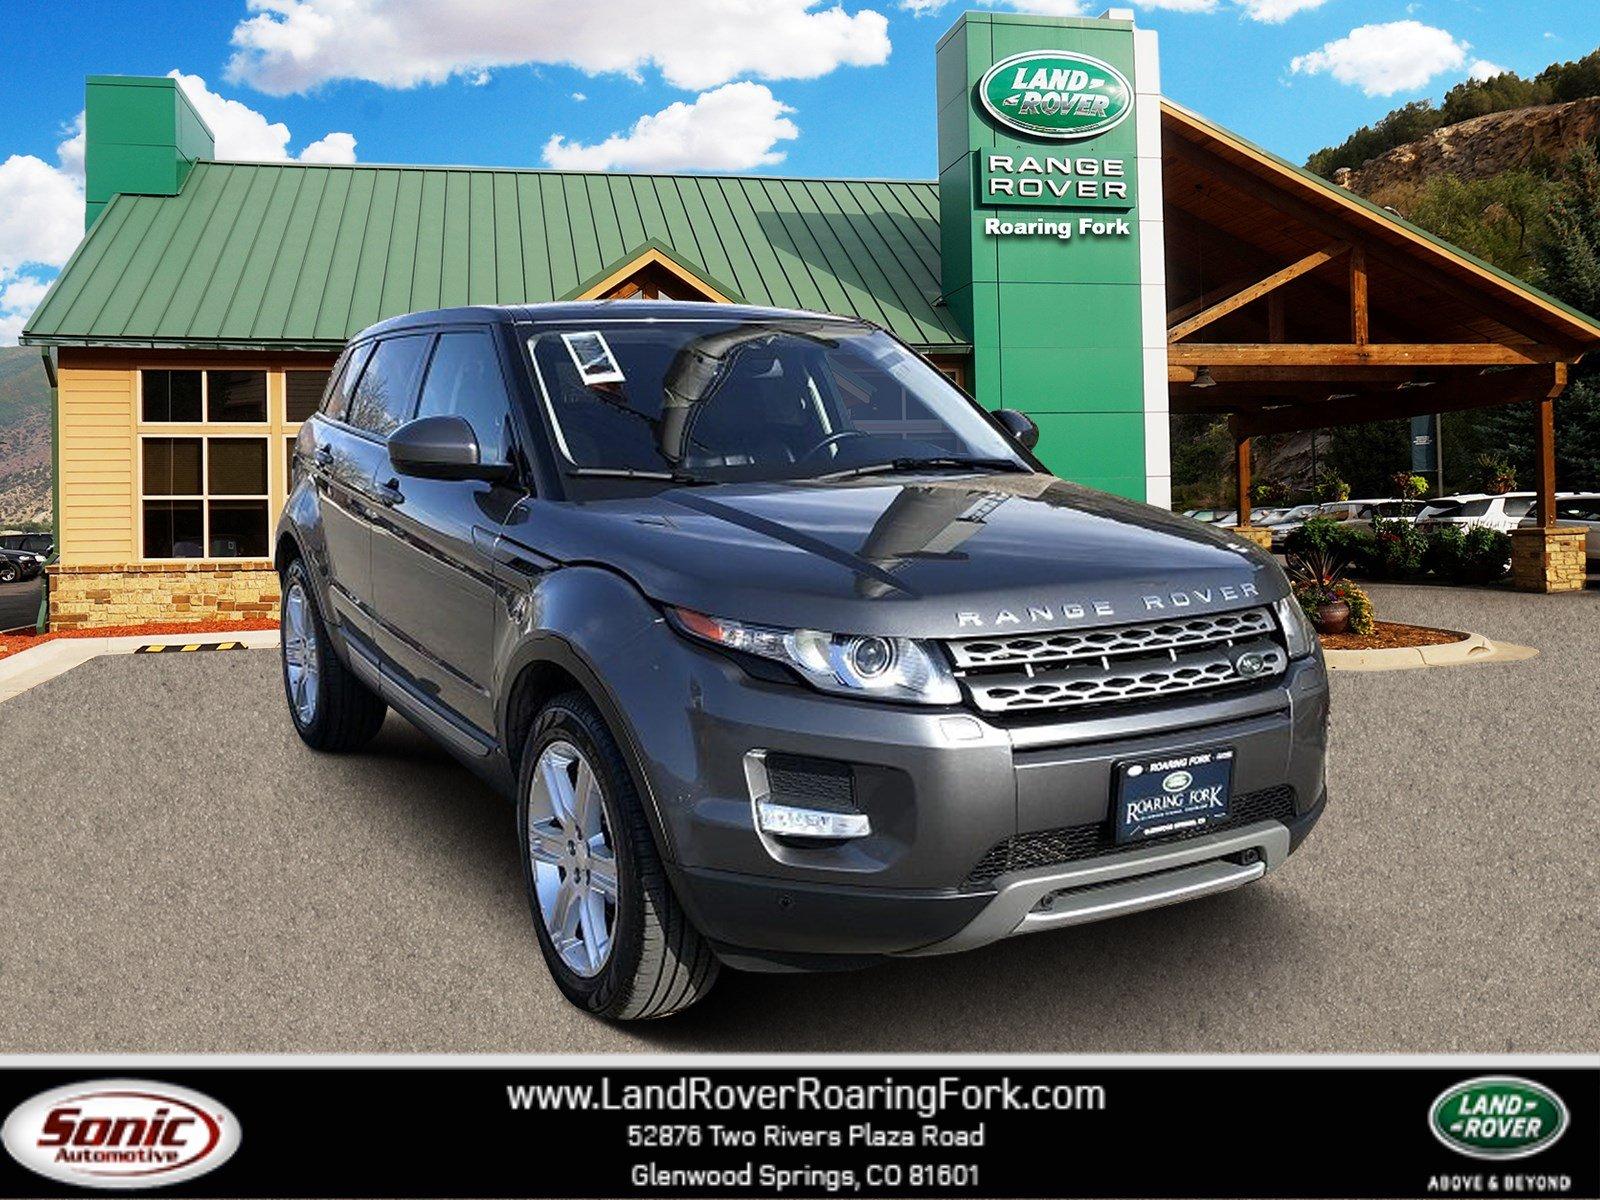 2015 Land Rover Range Rover Evoque Pure Plus 5dr HB